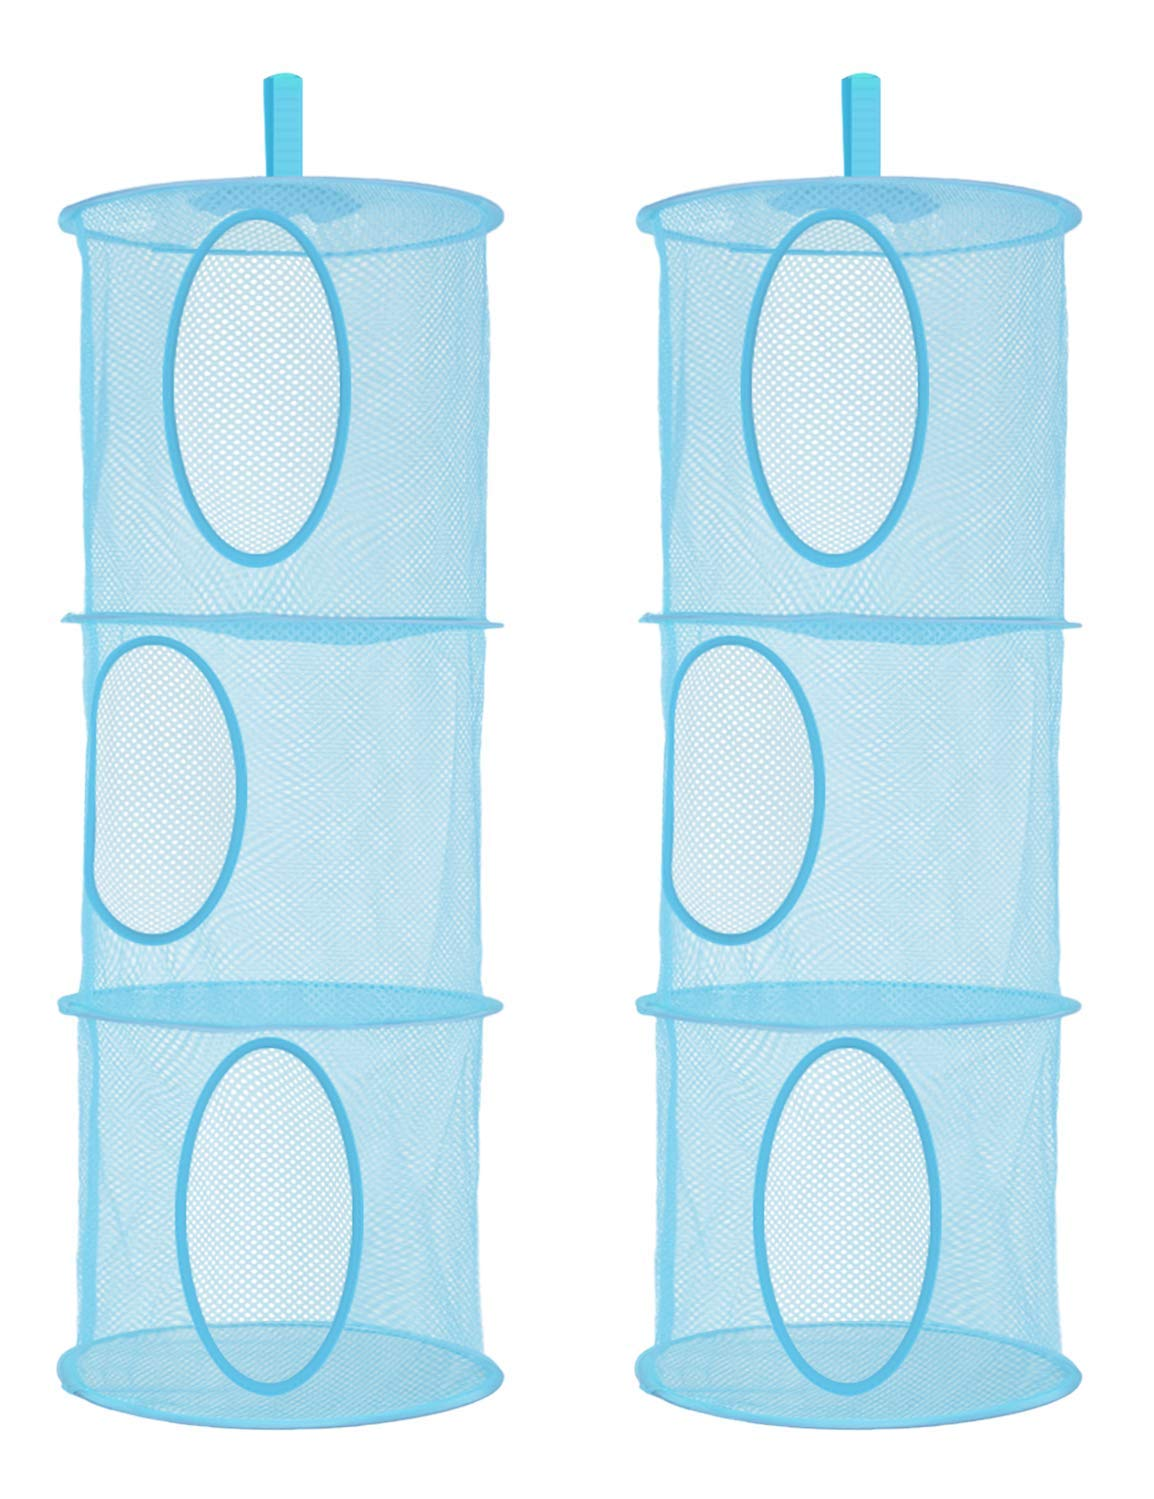 Libeder Mesh Hanging Storage Space Saver Bags Organizer,Foldable Storage Organizer 3 Compartments Toy Storage Basket for Kids Room Bathroom 2 Sets Blue